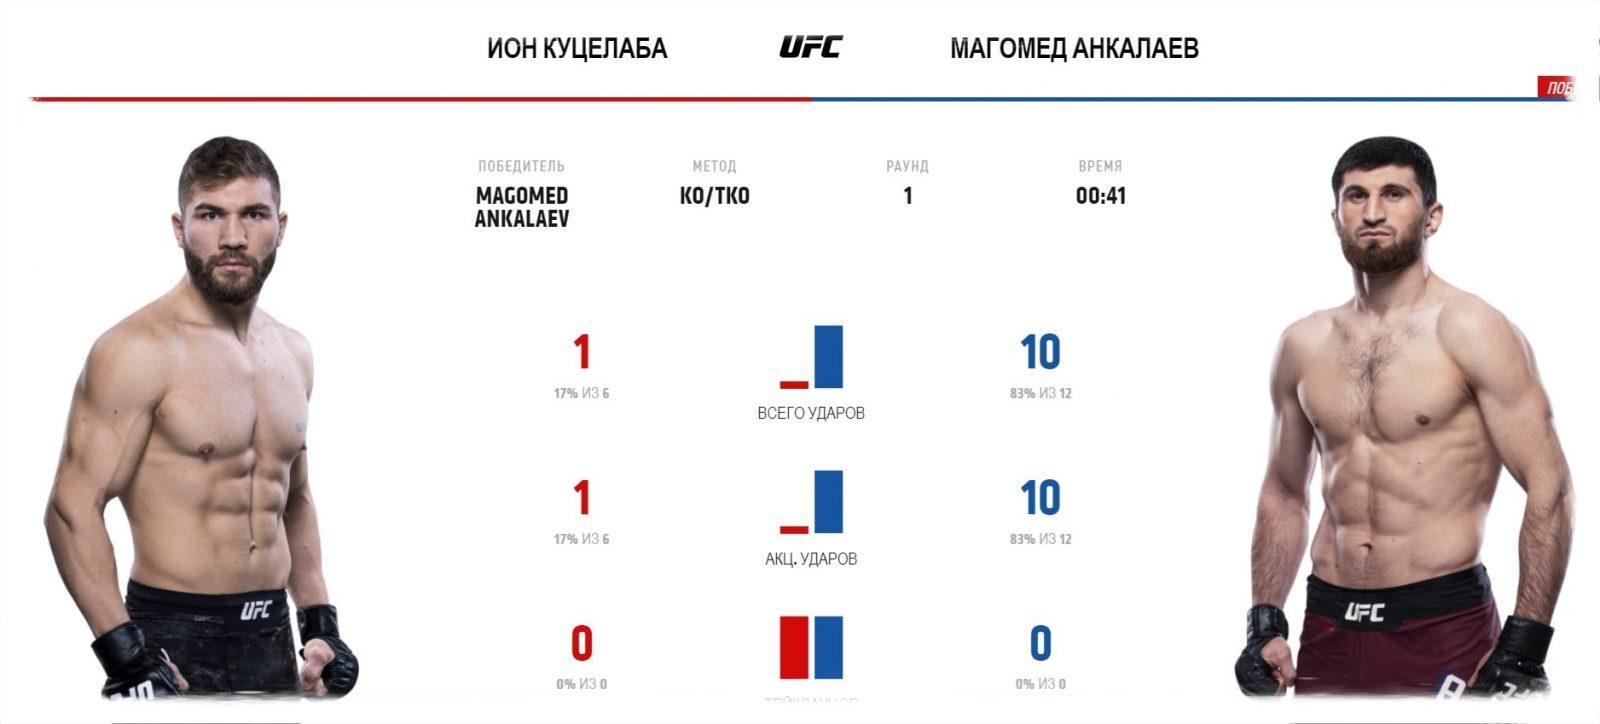 video-boya-magomed-ankalaev-ion-kucelaba-magomed-ankalaev-ion-cu-elaba-ufc-fight-night-169